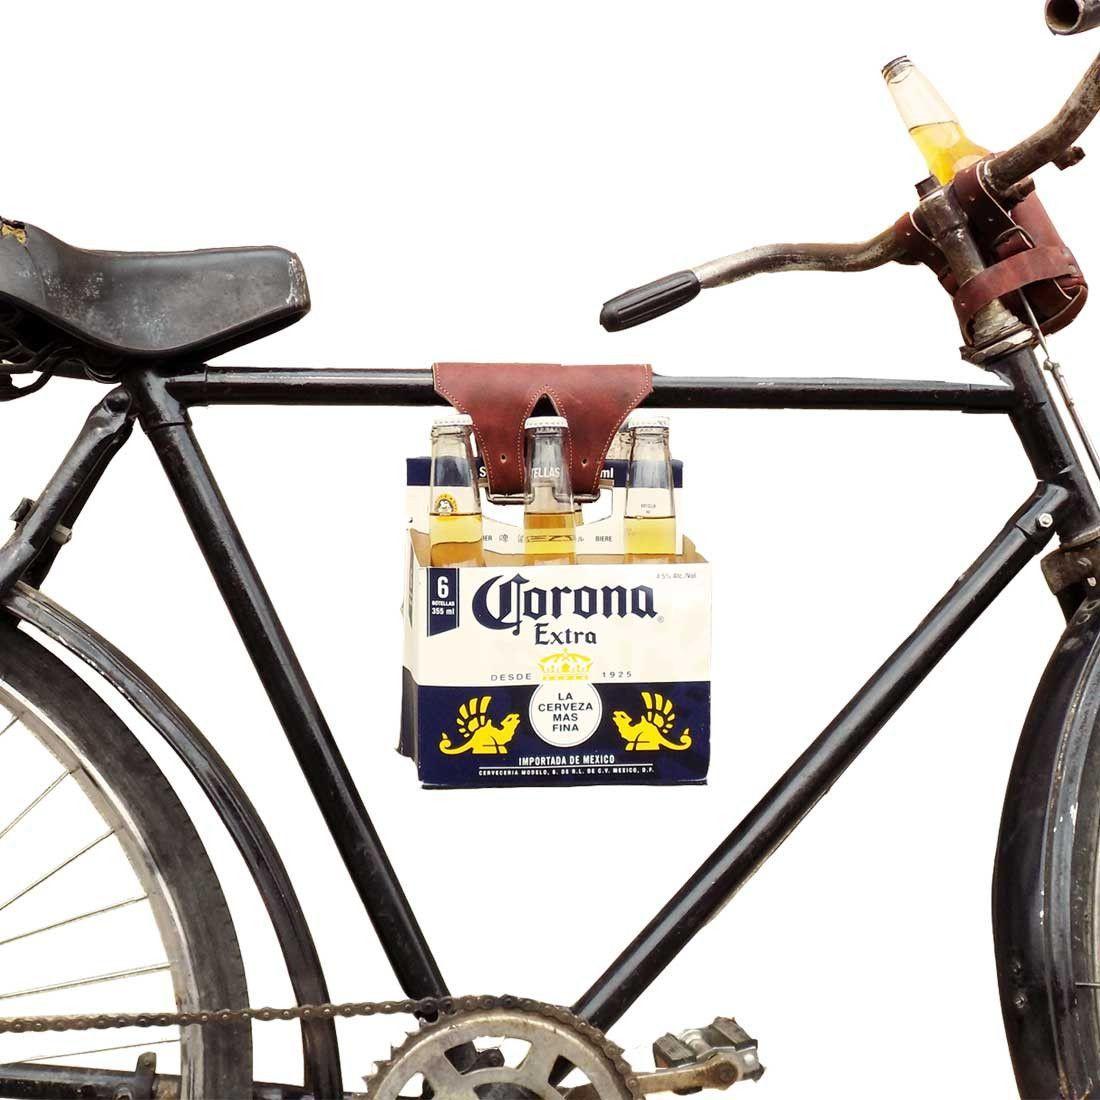 Six Pack Cinch | Lederbearbeitung | Pinterest | Fahrräder und Leder